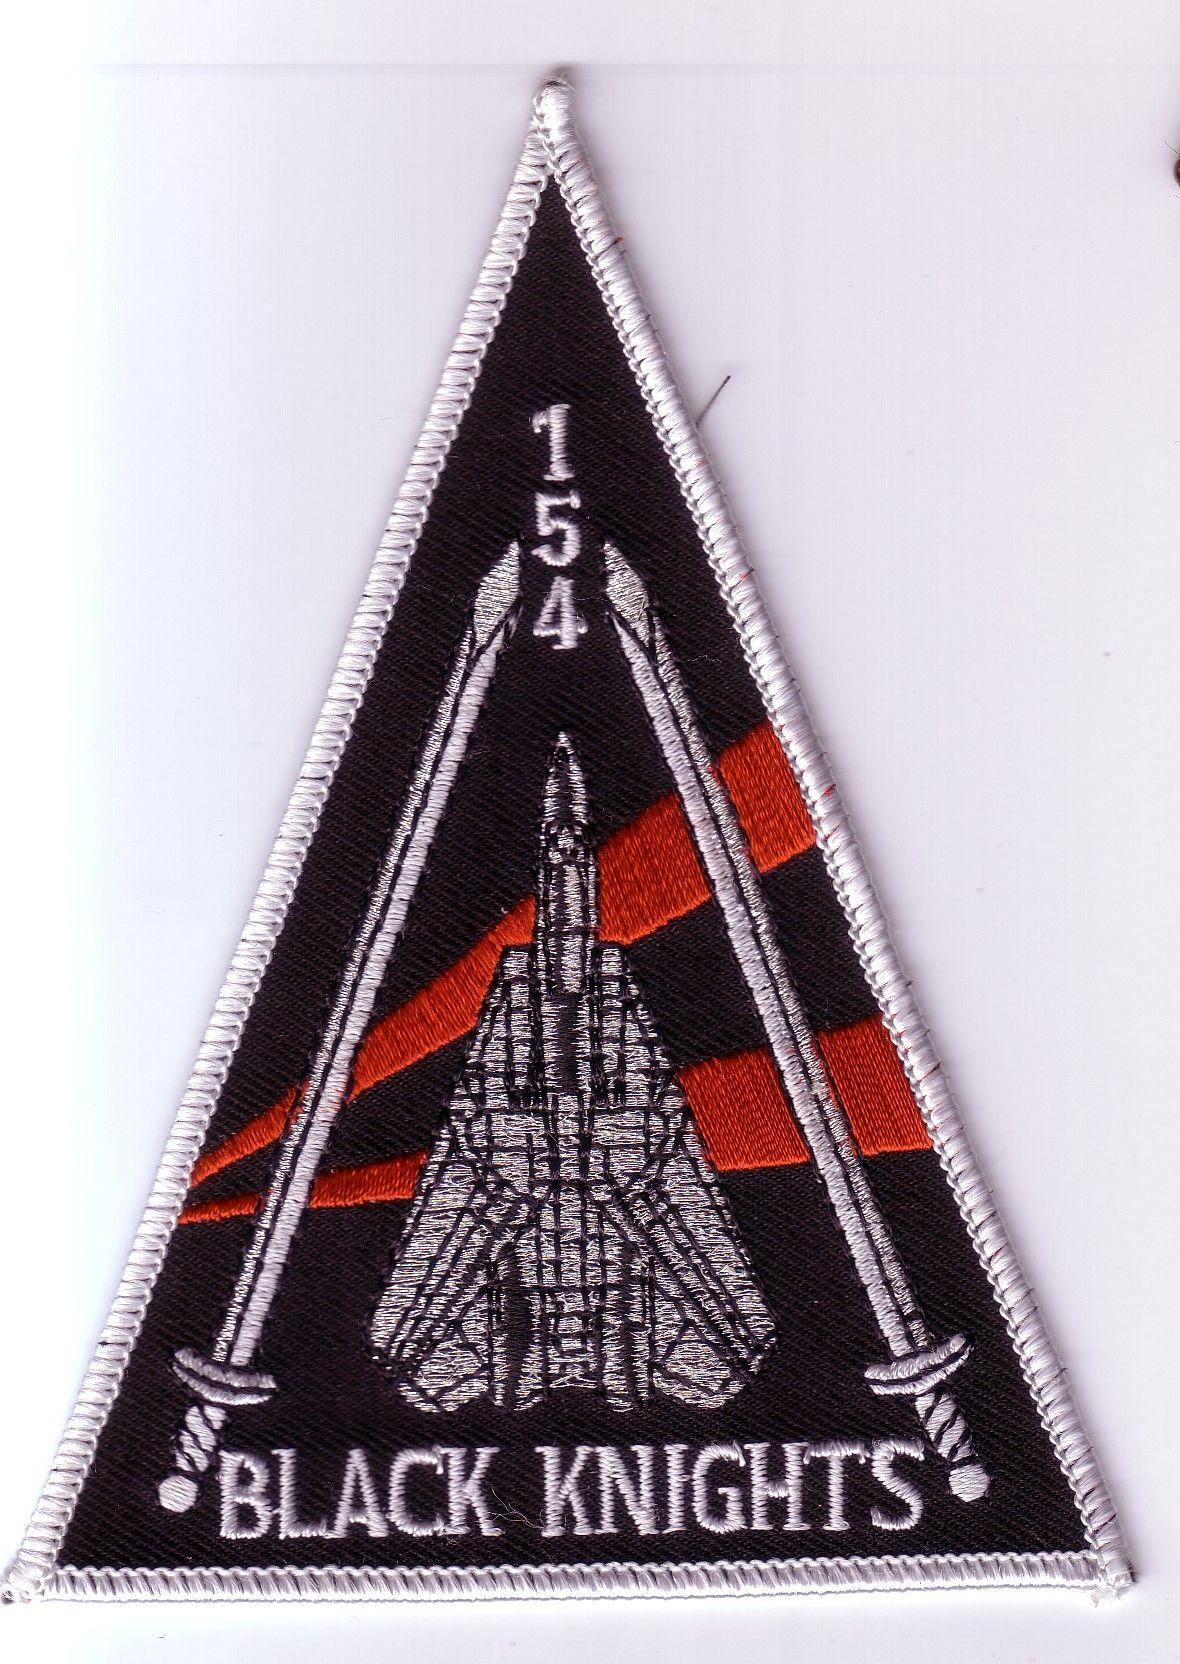 VF-154 BLACK KNIGHTS - F-14 TOMCAT Shoulder Triangle